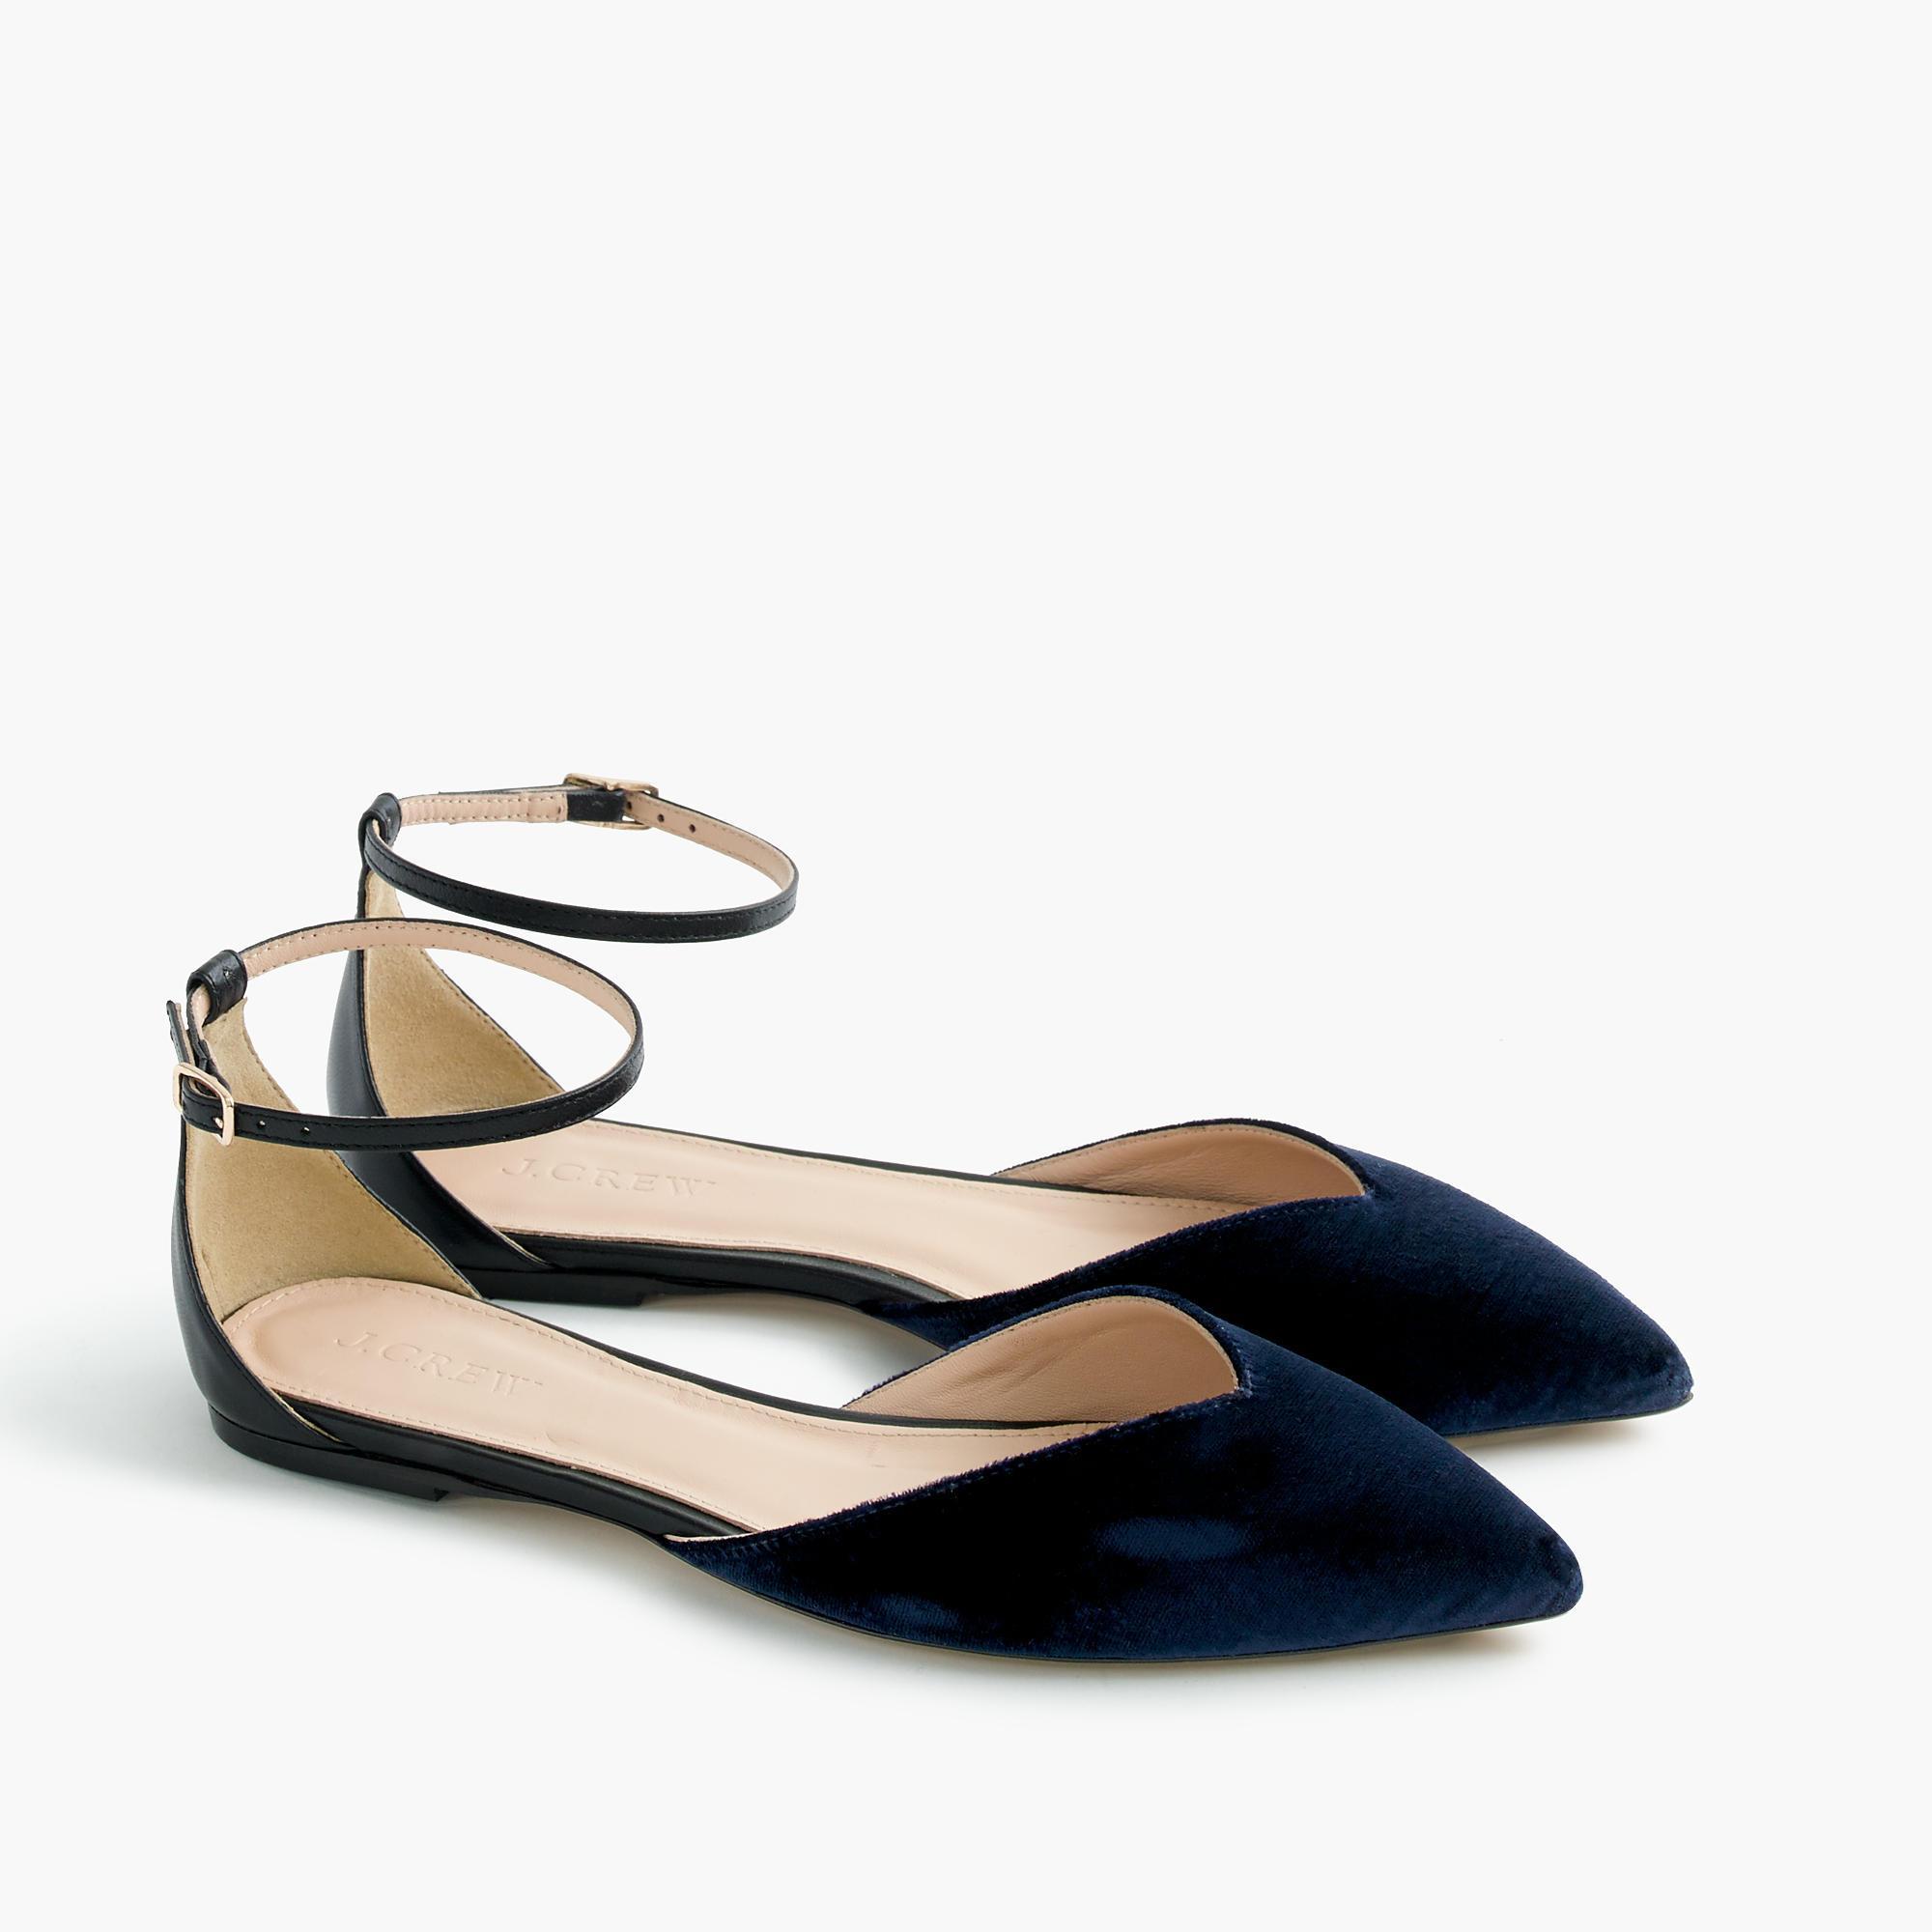 cceac4d3f46b J.crew Sadie Ankle-strap Flats In Velvet